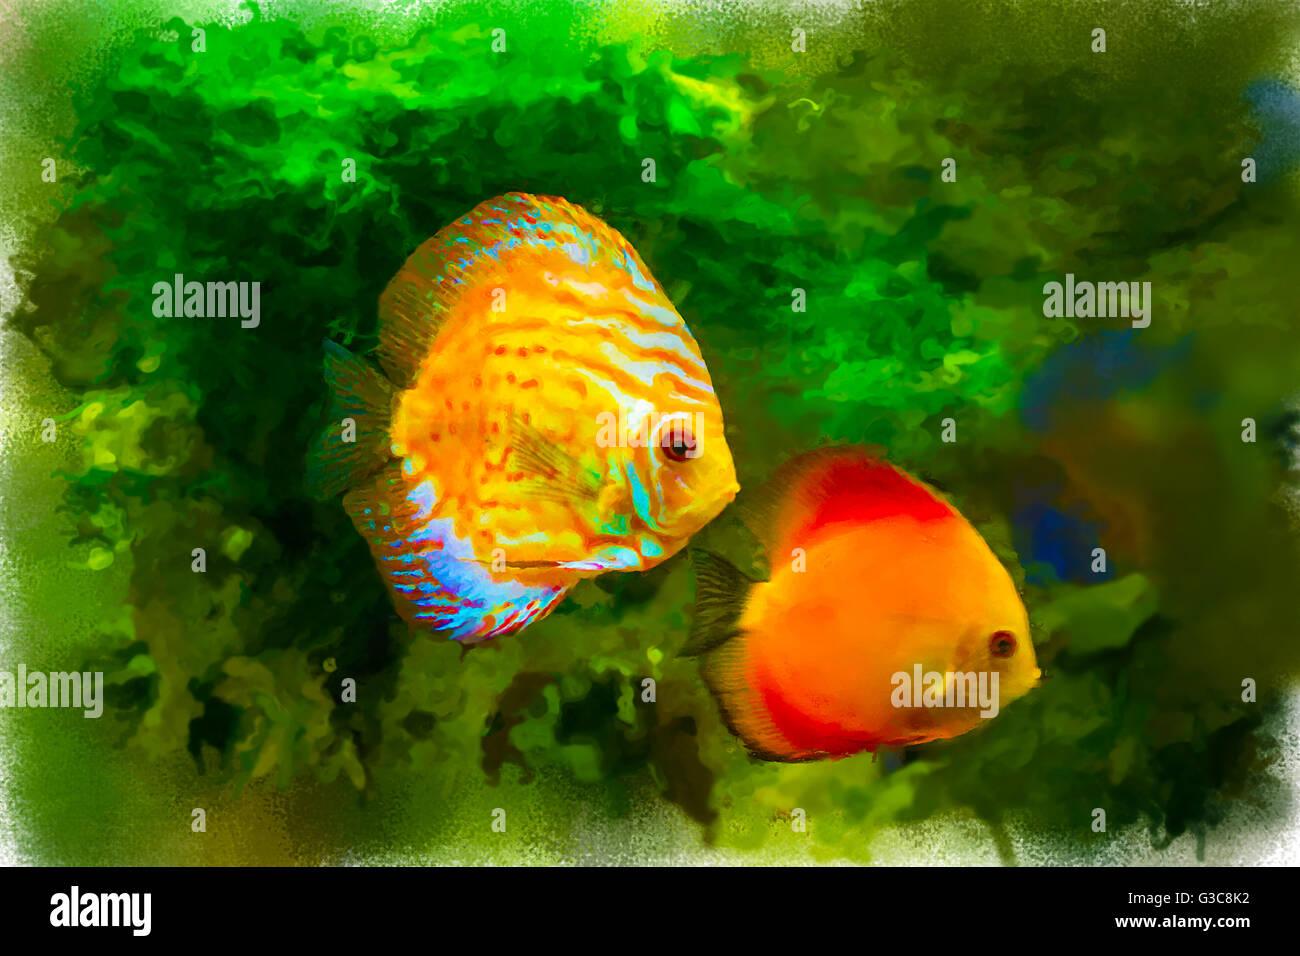 Watercolor Fish Illustration Stock Photos & Watercolor Fish ...